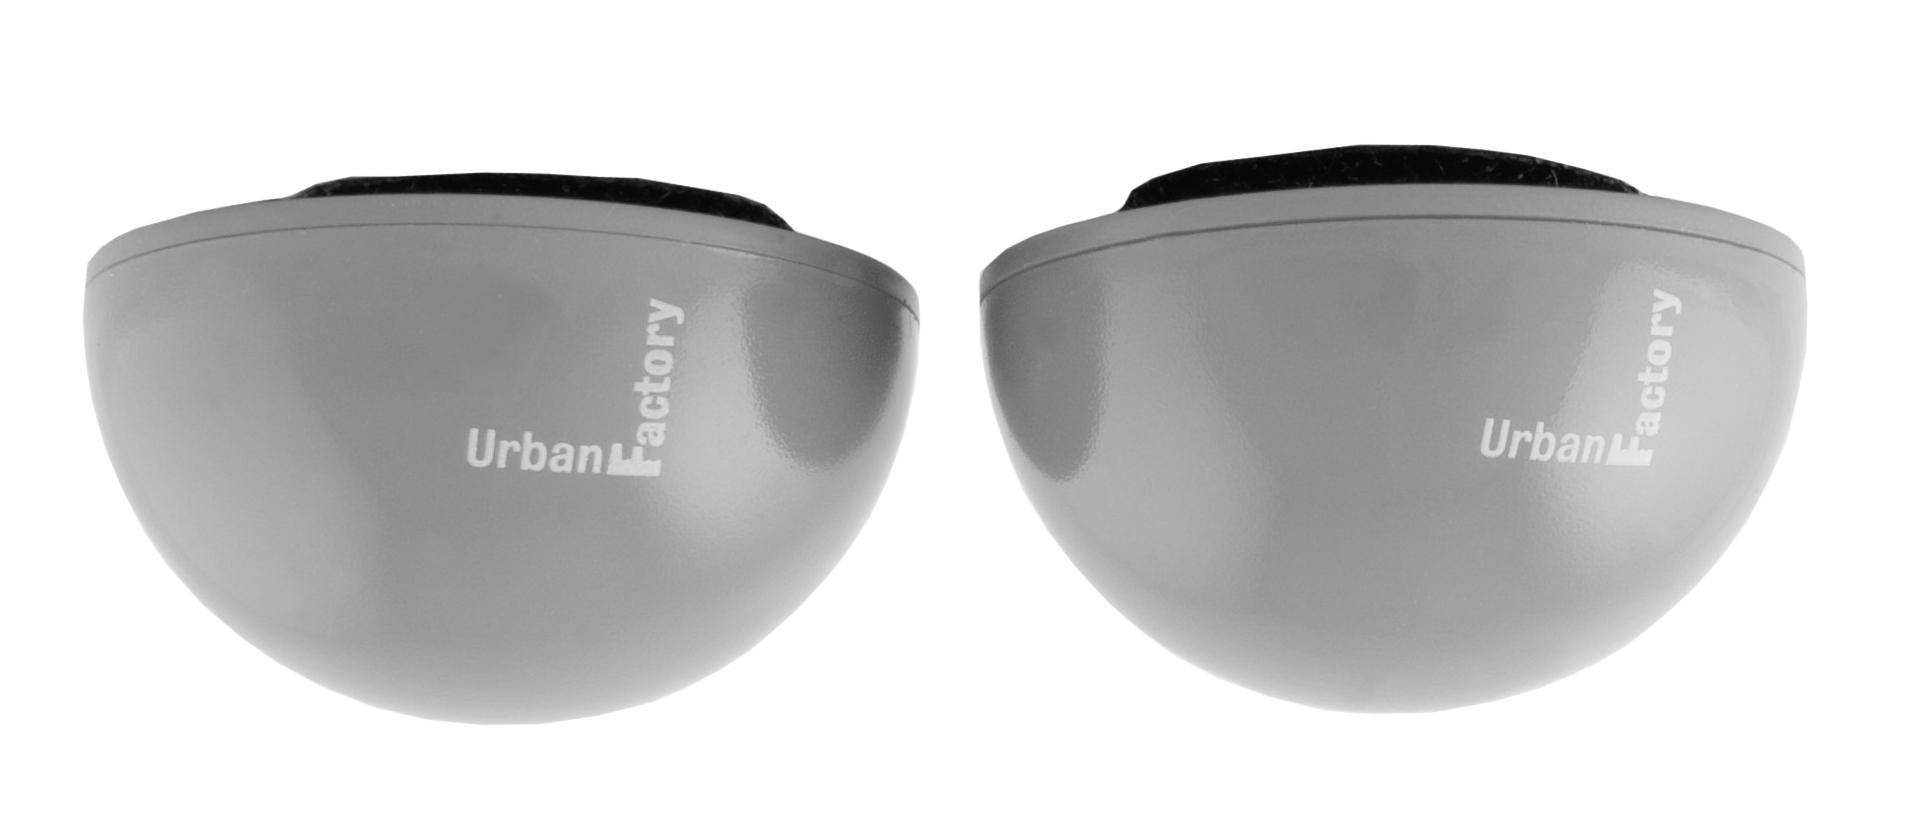 Urban Factory MWC05UF accesorio para portatil Patas de goma para ordenador portátil